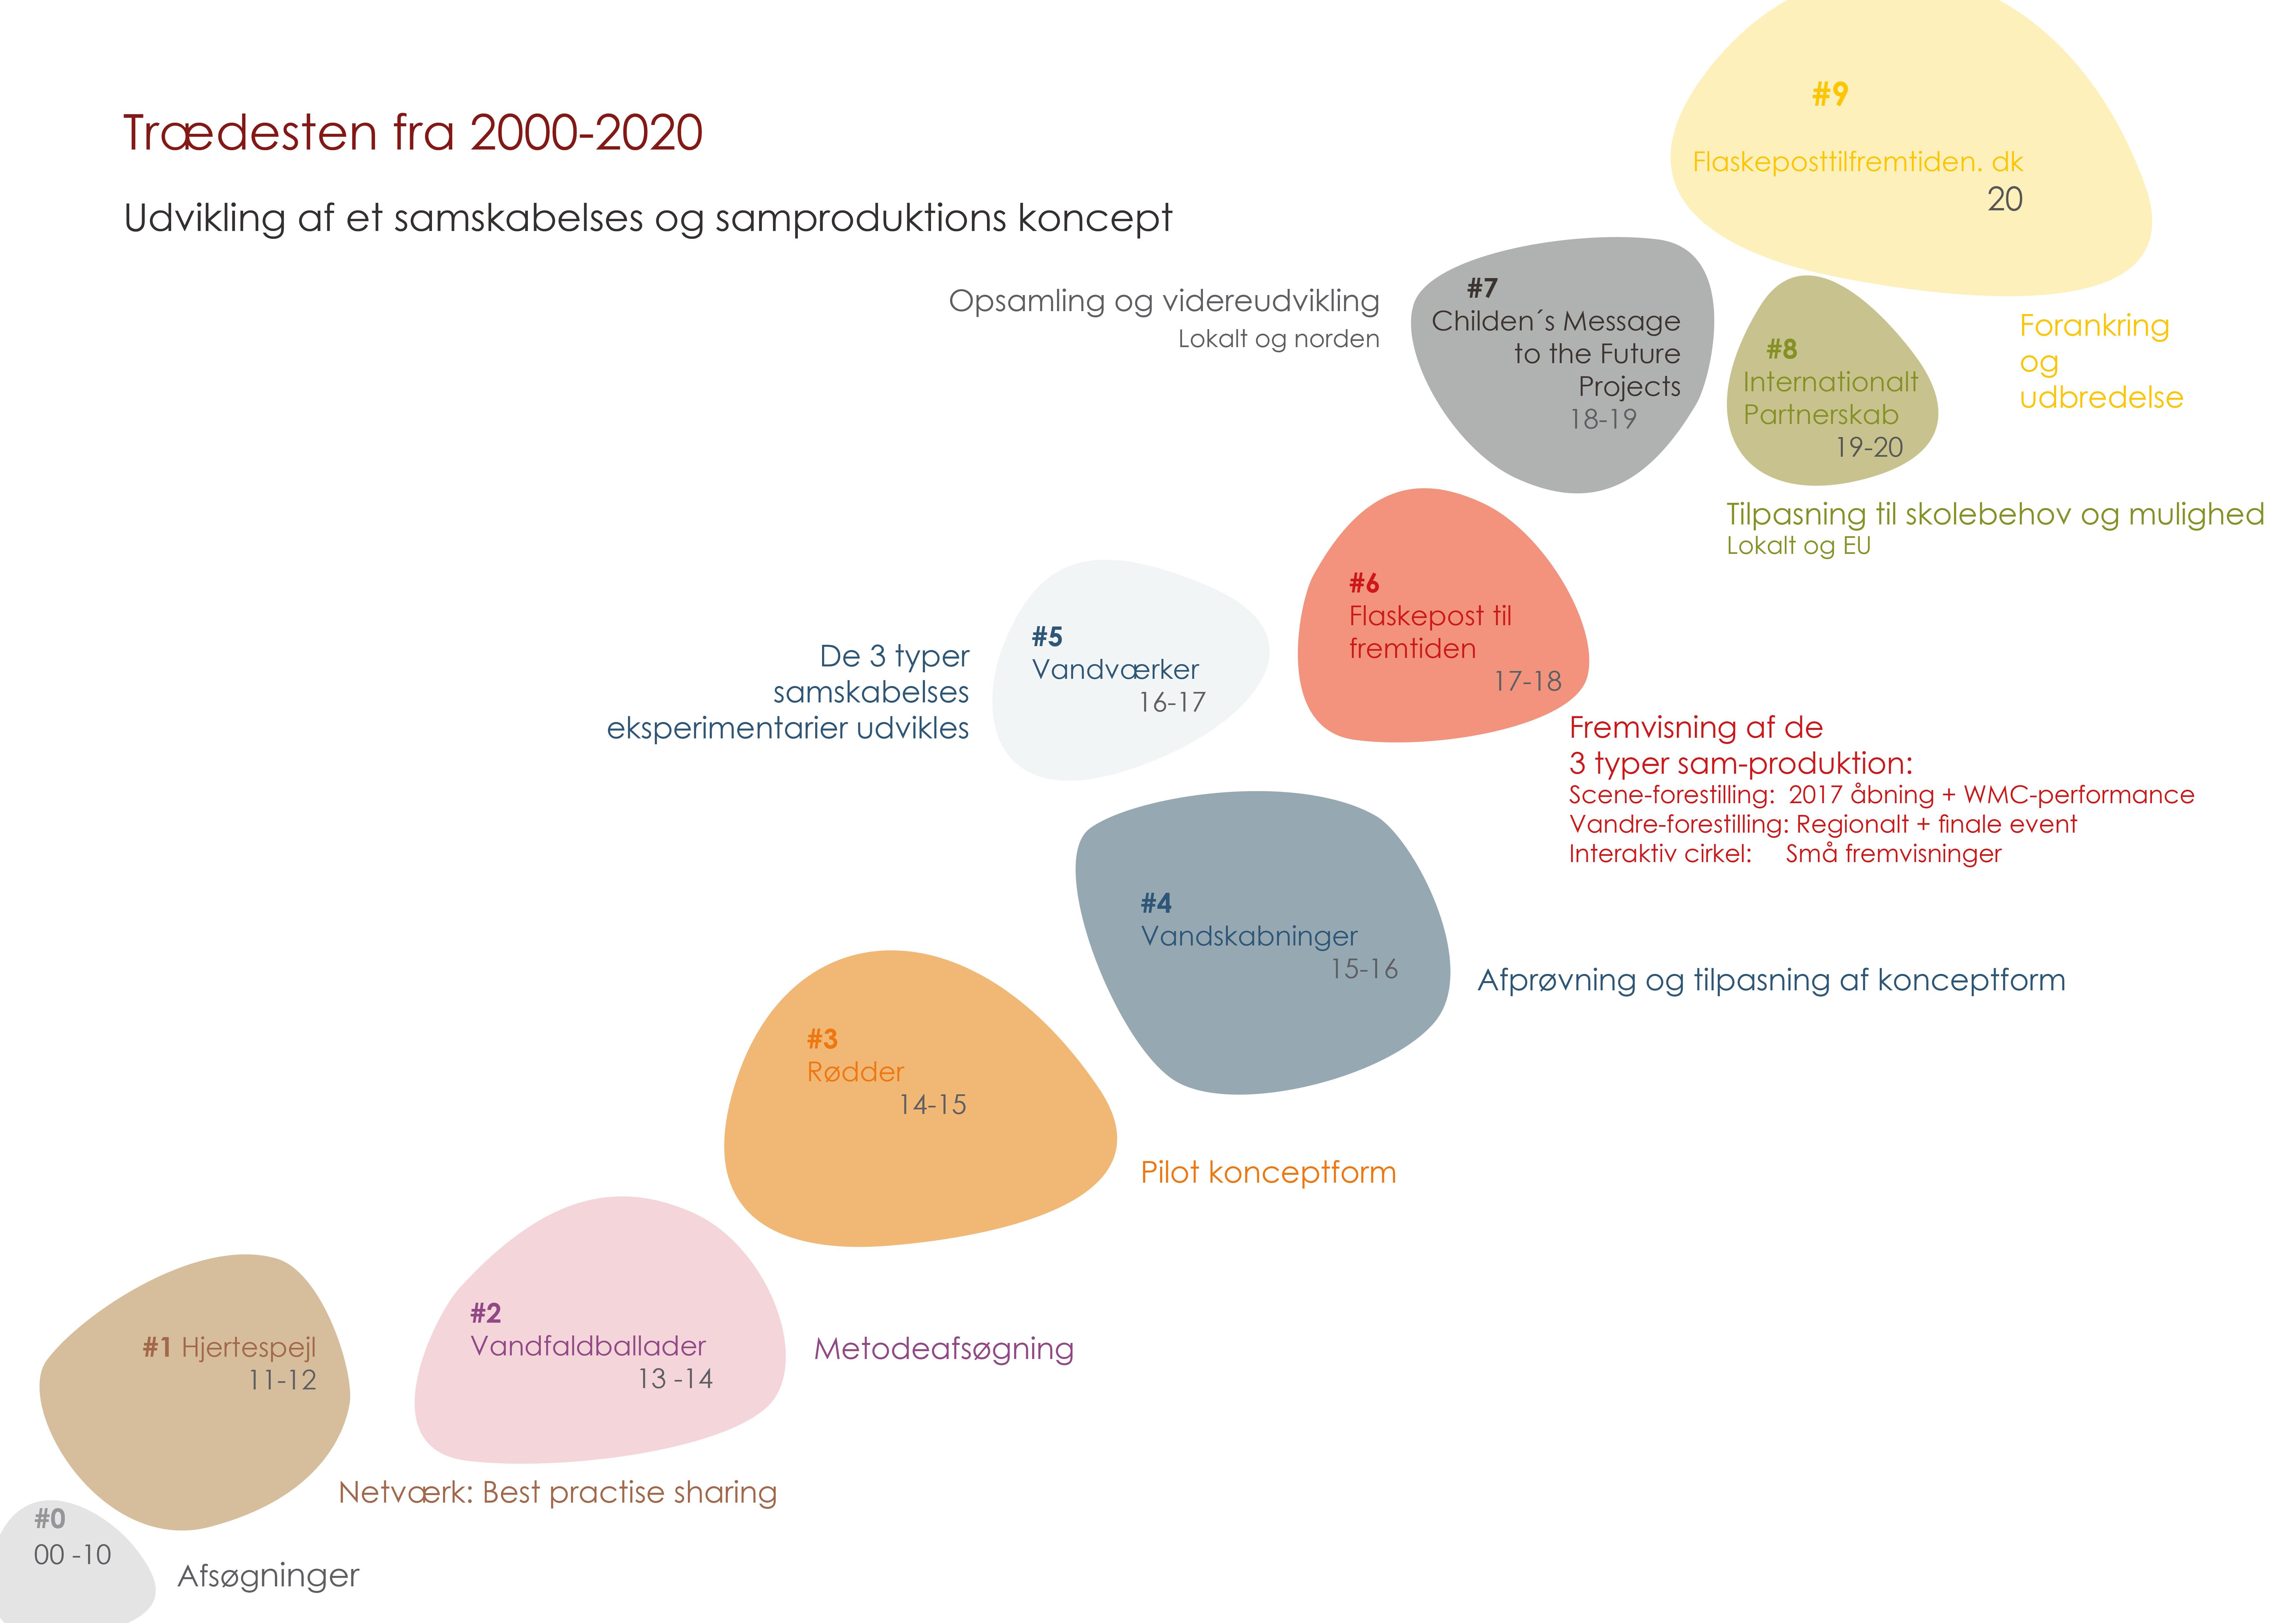 Trædesten 2000-2020